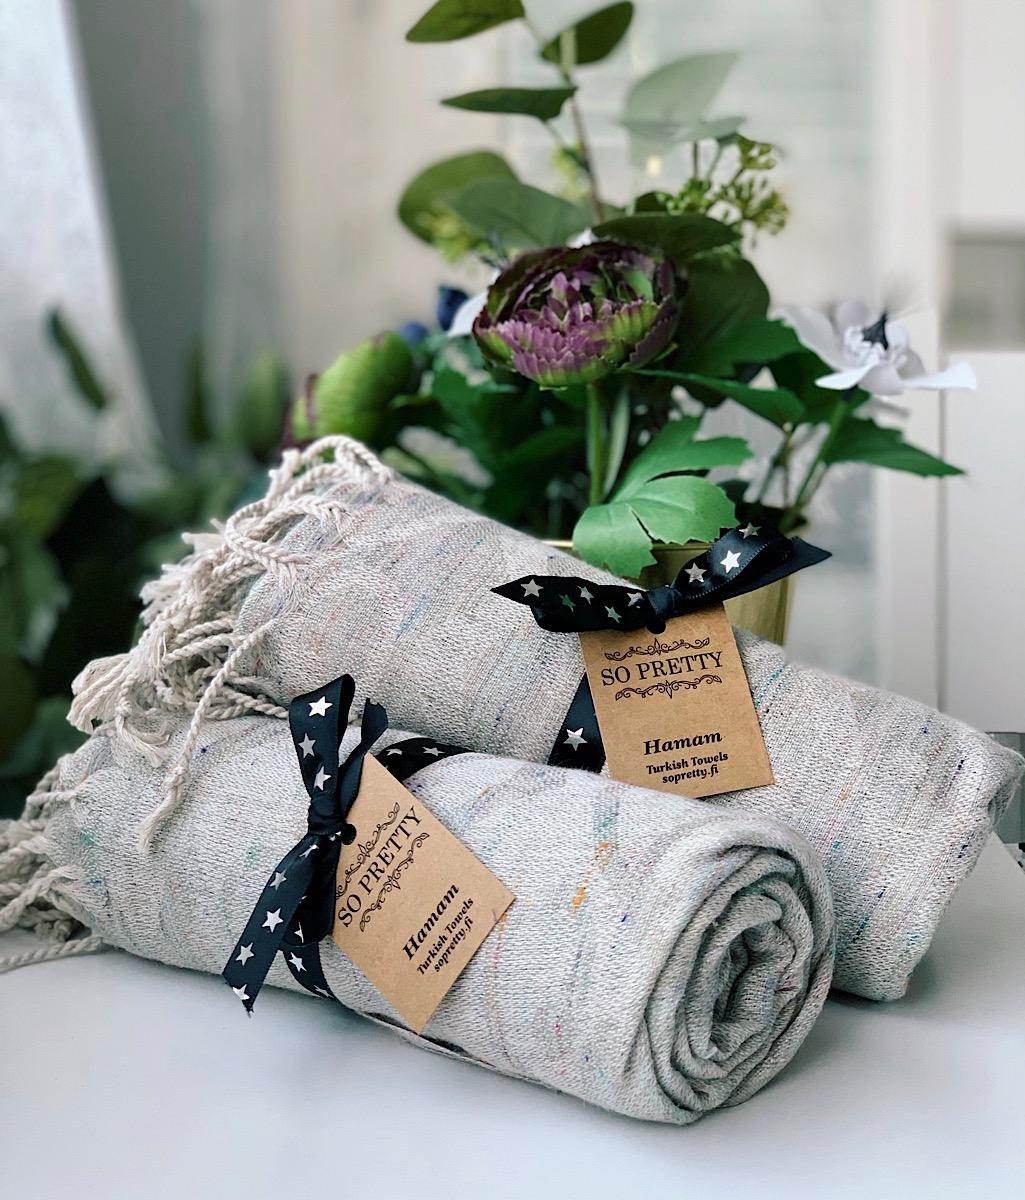 Miksi hamam-pyyhe on loistava liikelahja?